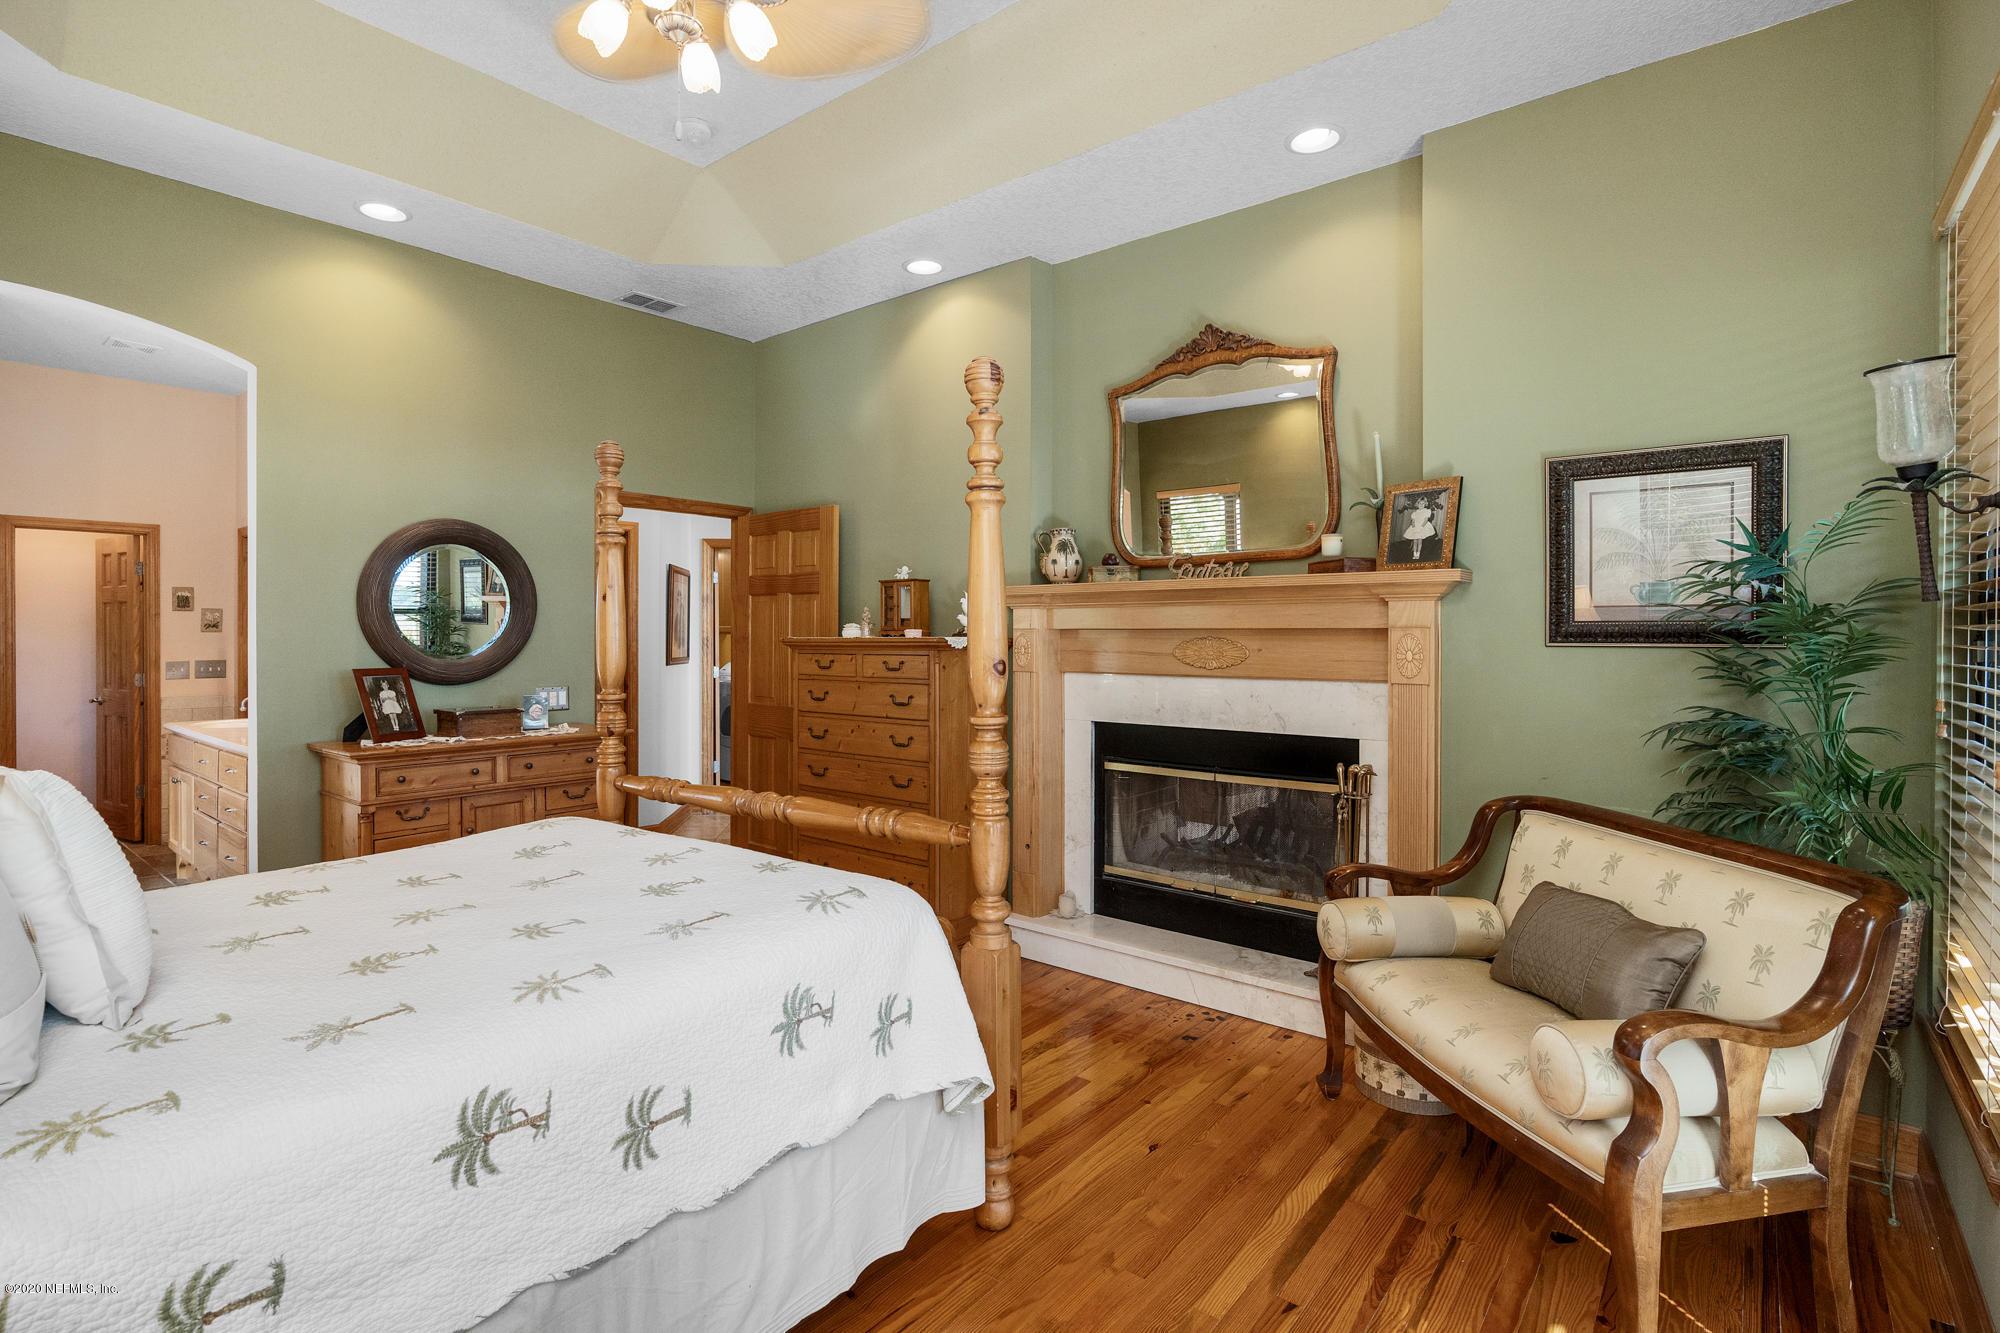 13385 SAWPIT, JACKSONVILLE, FLORIDA 32226, 3 Bedrooms Bedrooms, ,3 BathroomsBathrooms,Residential,For sale,SAWPIT,1081342